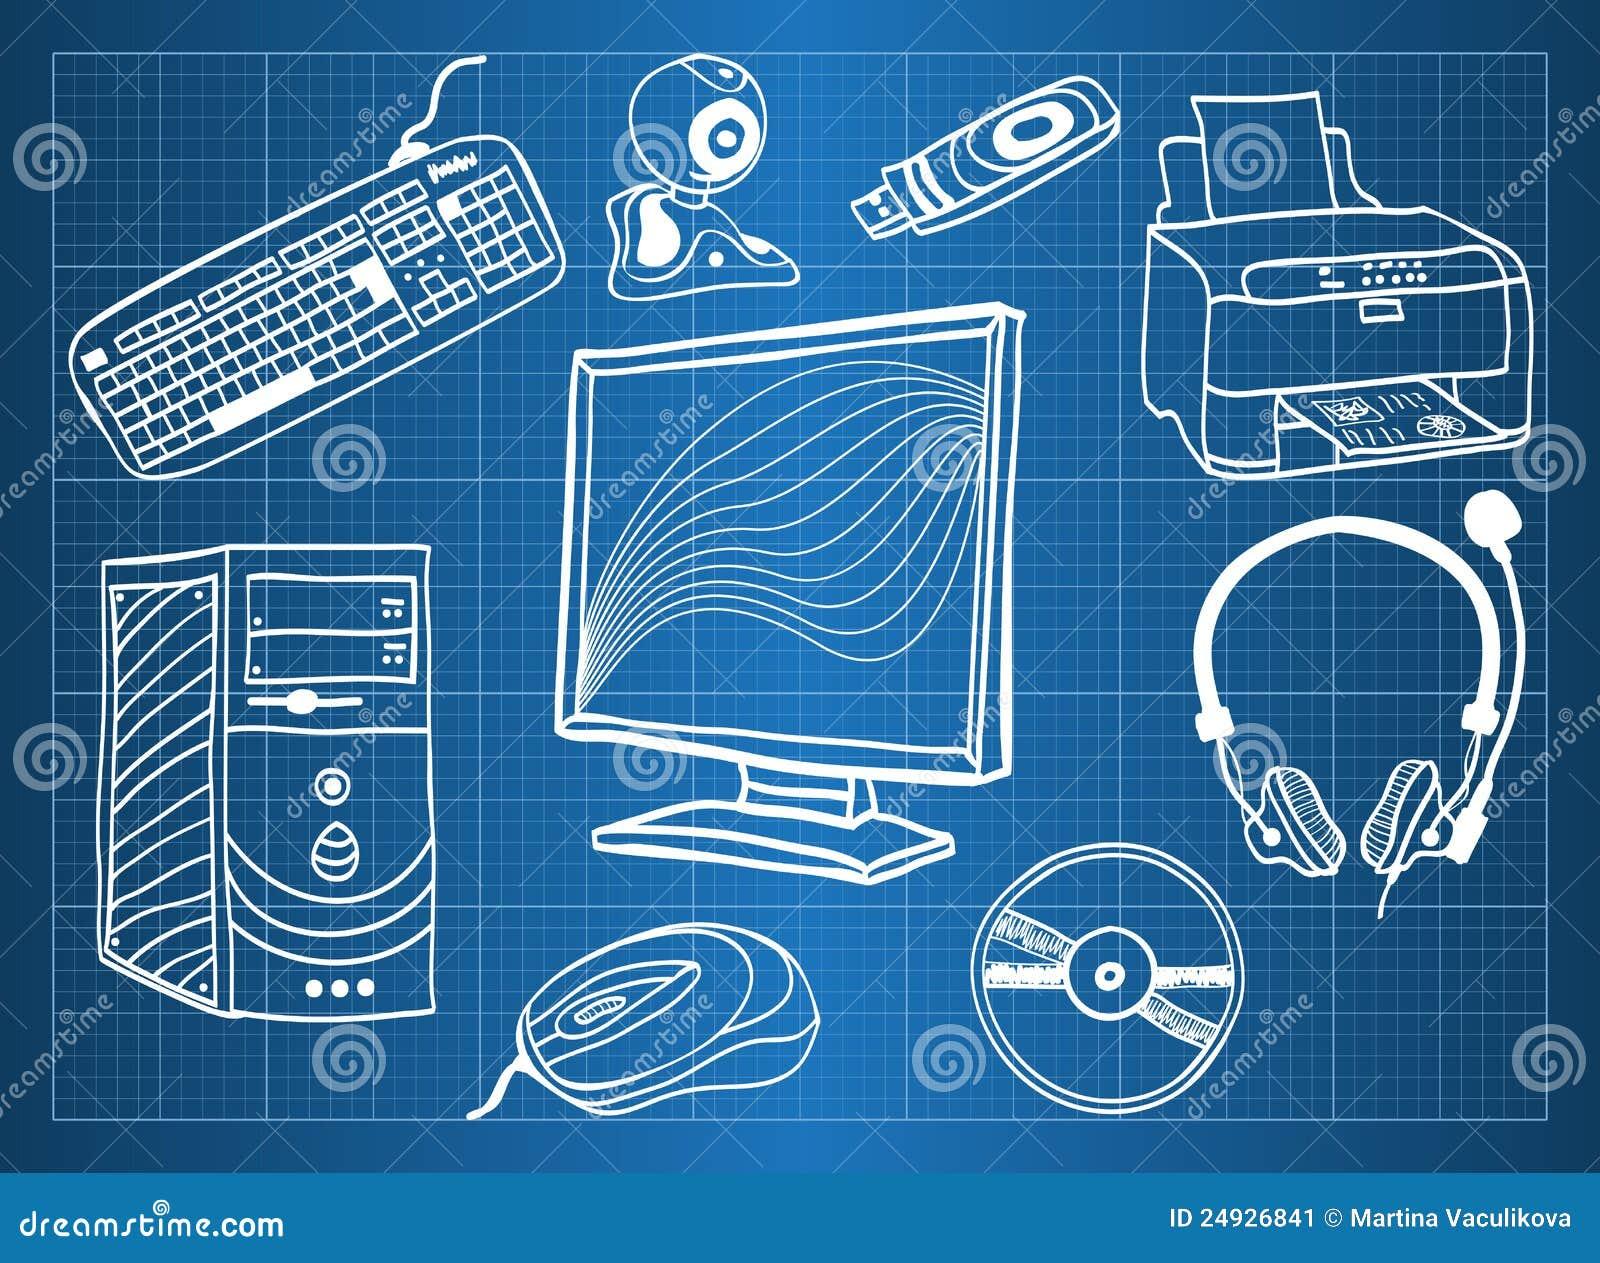 computer hardware - peripherals stock image